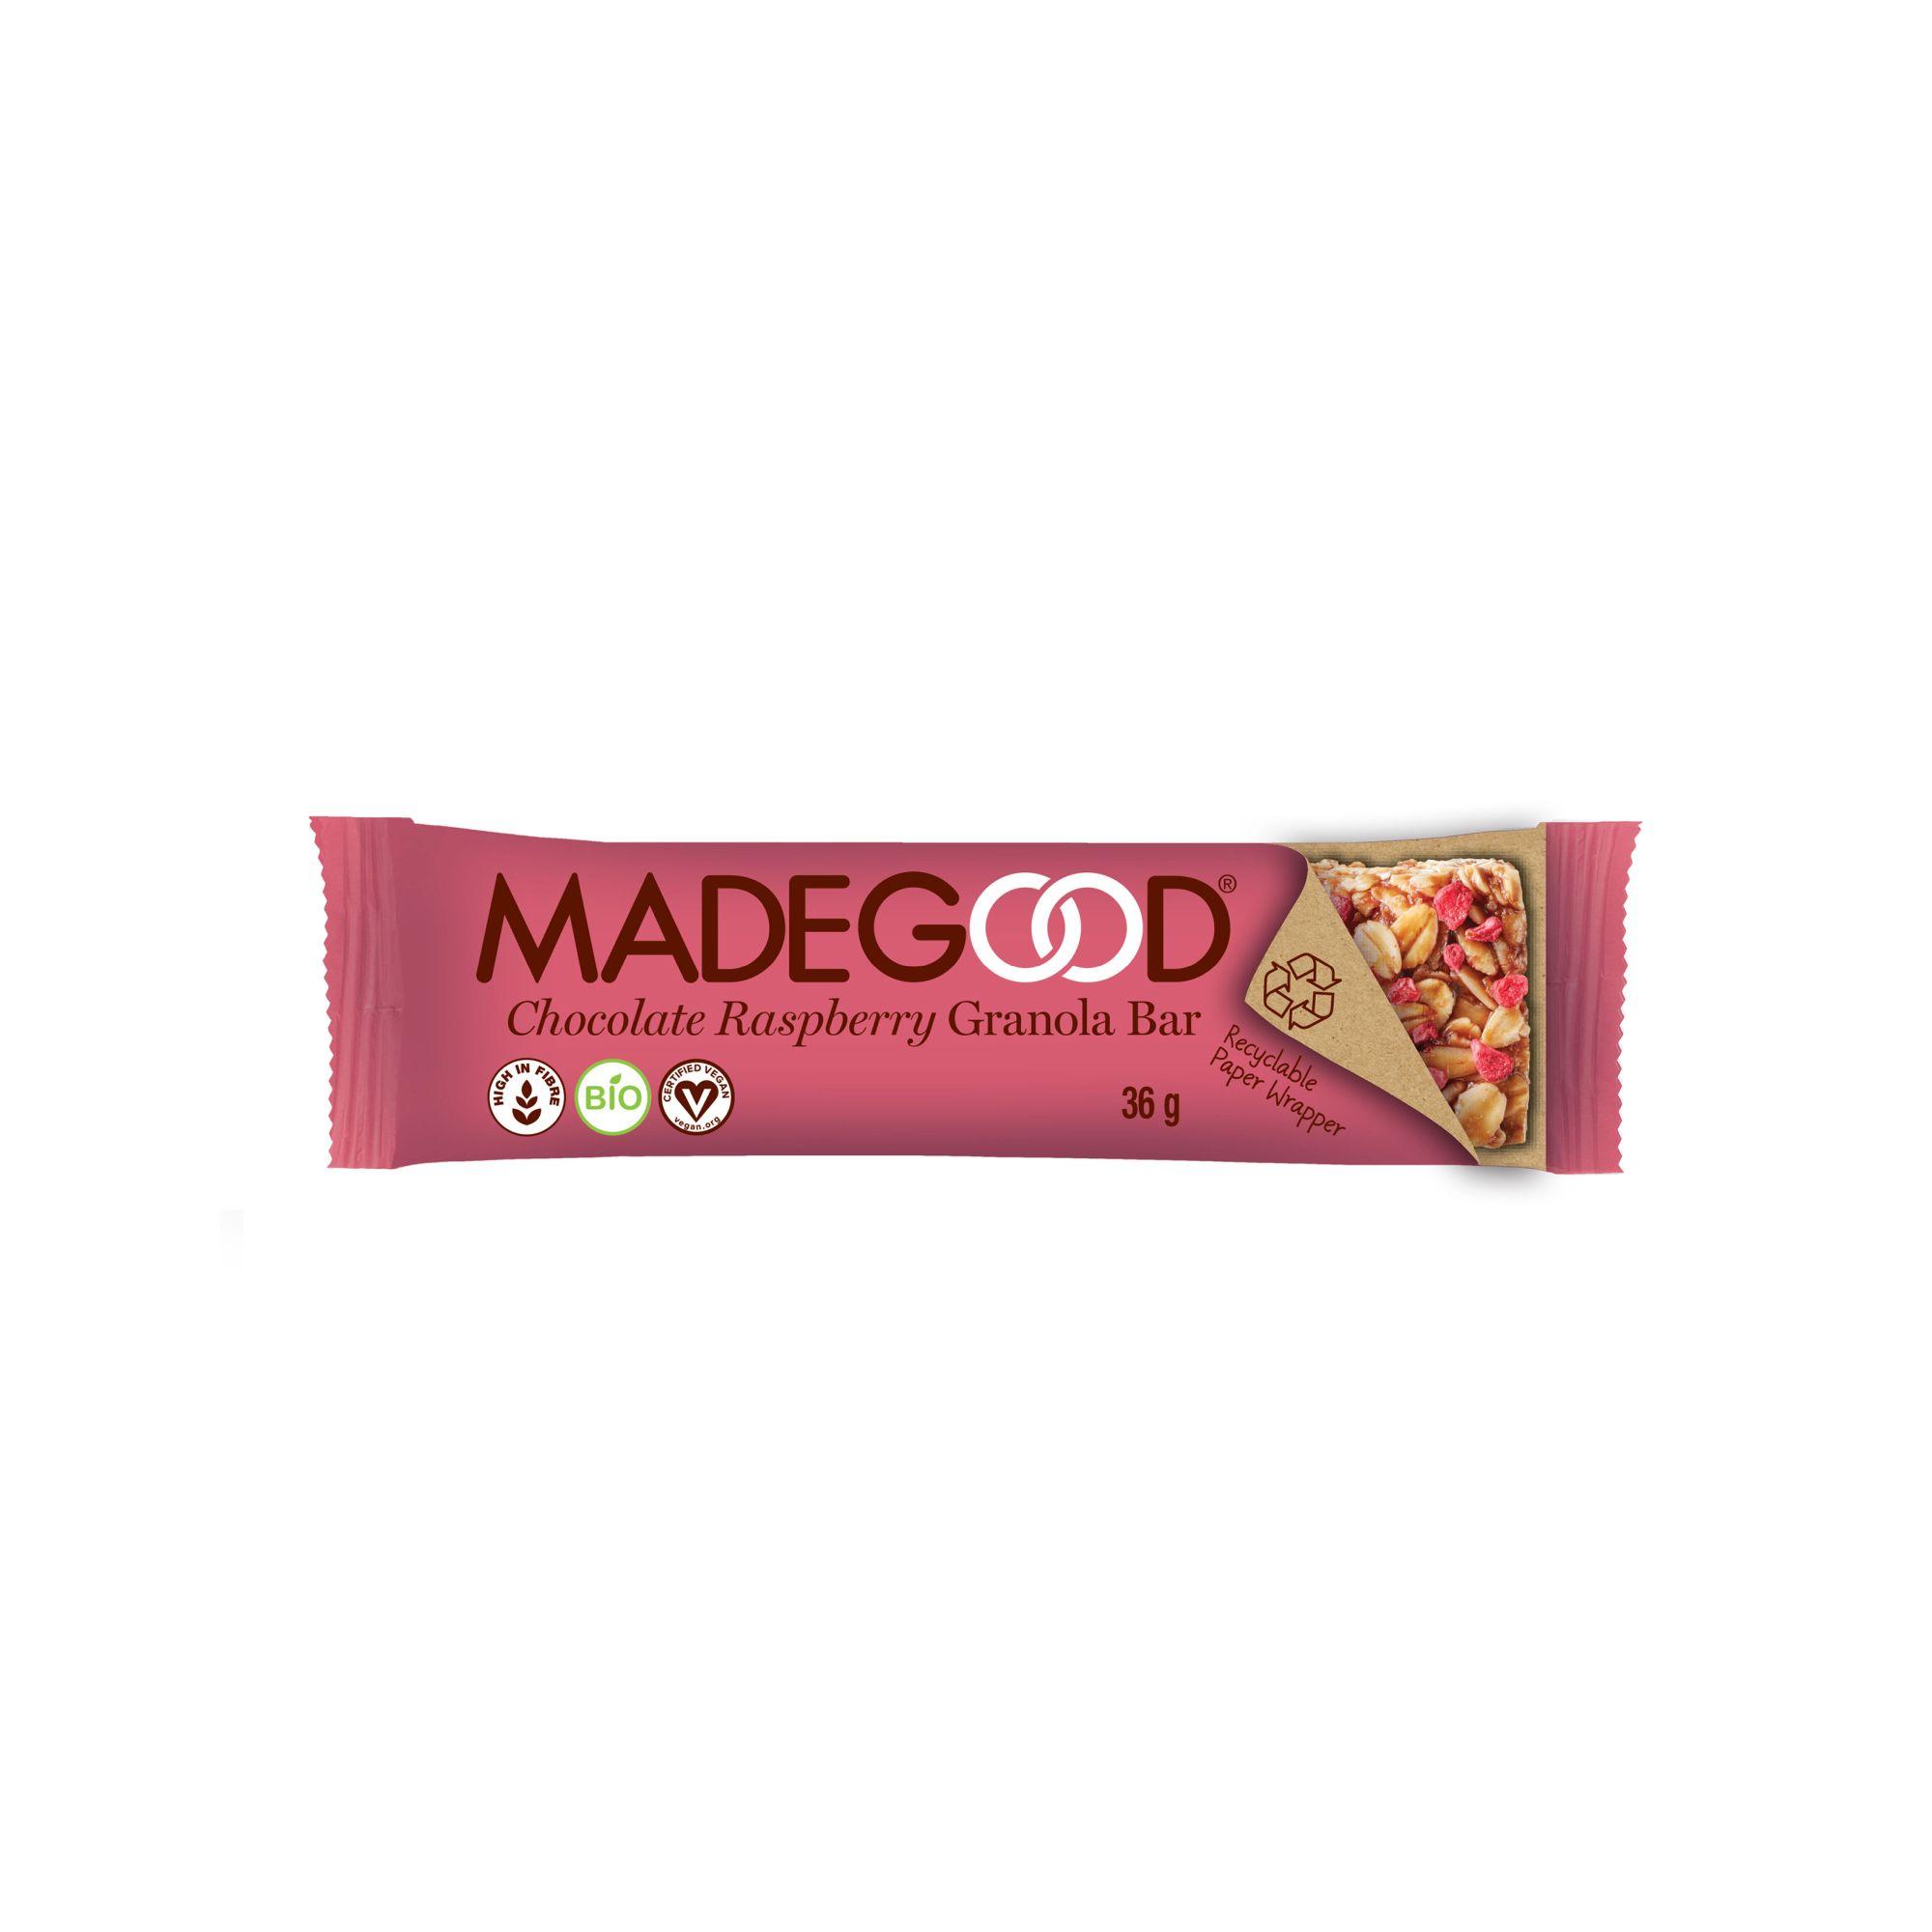 MGIN-36g-Bar-Chocolate Raspberry